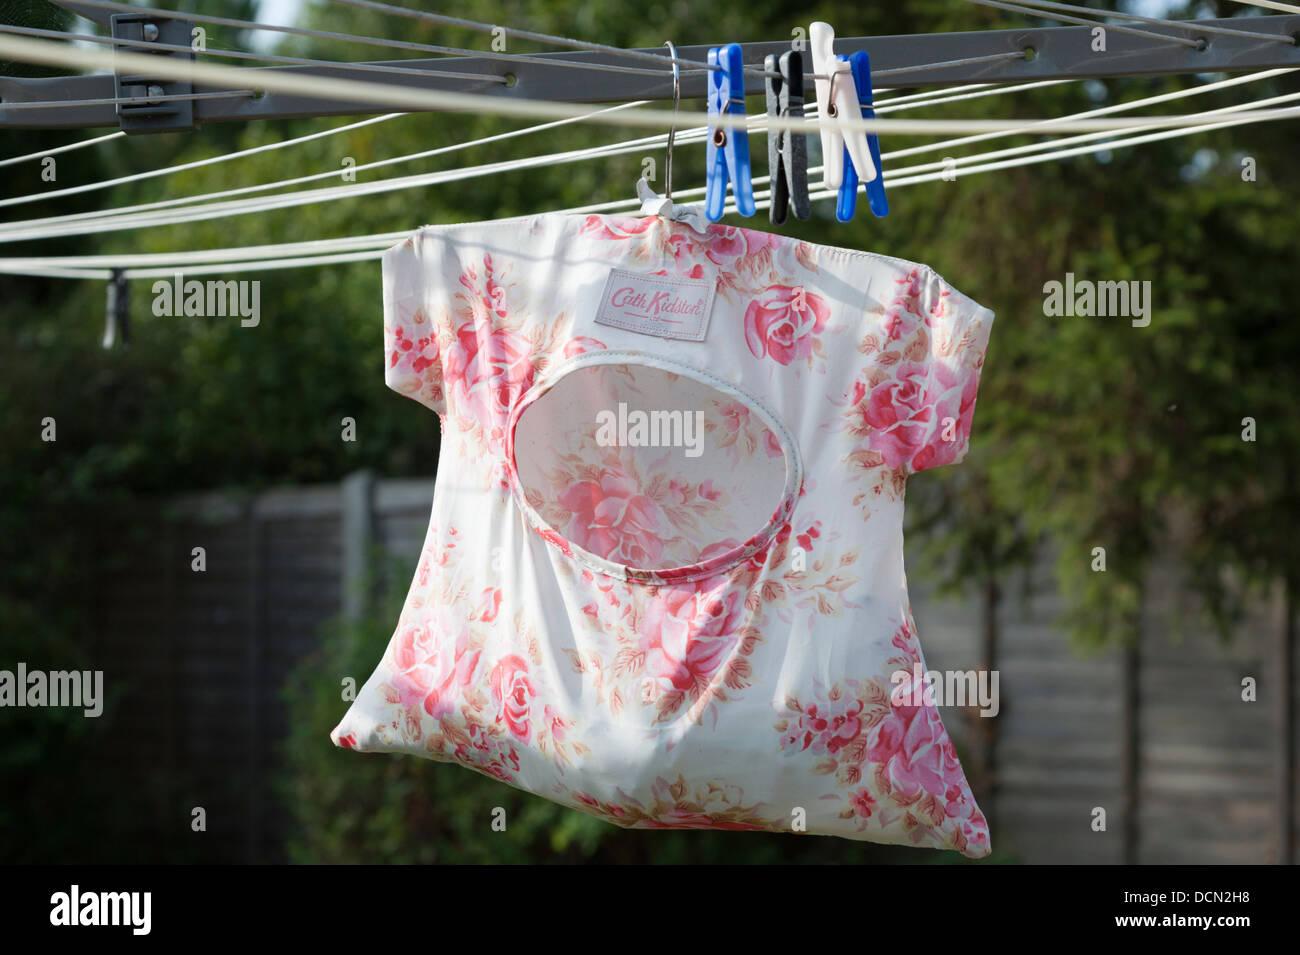 Cath Kidson peg bag hanging on a washing line - Stock Image